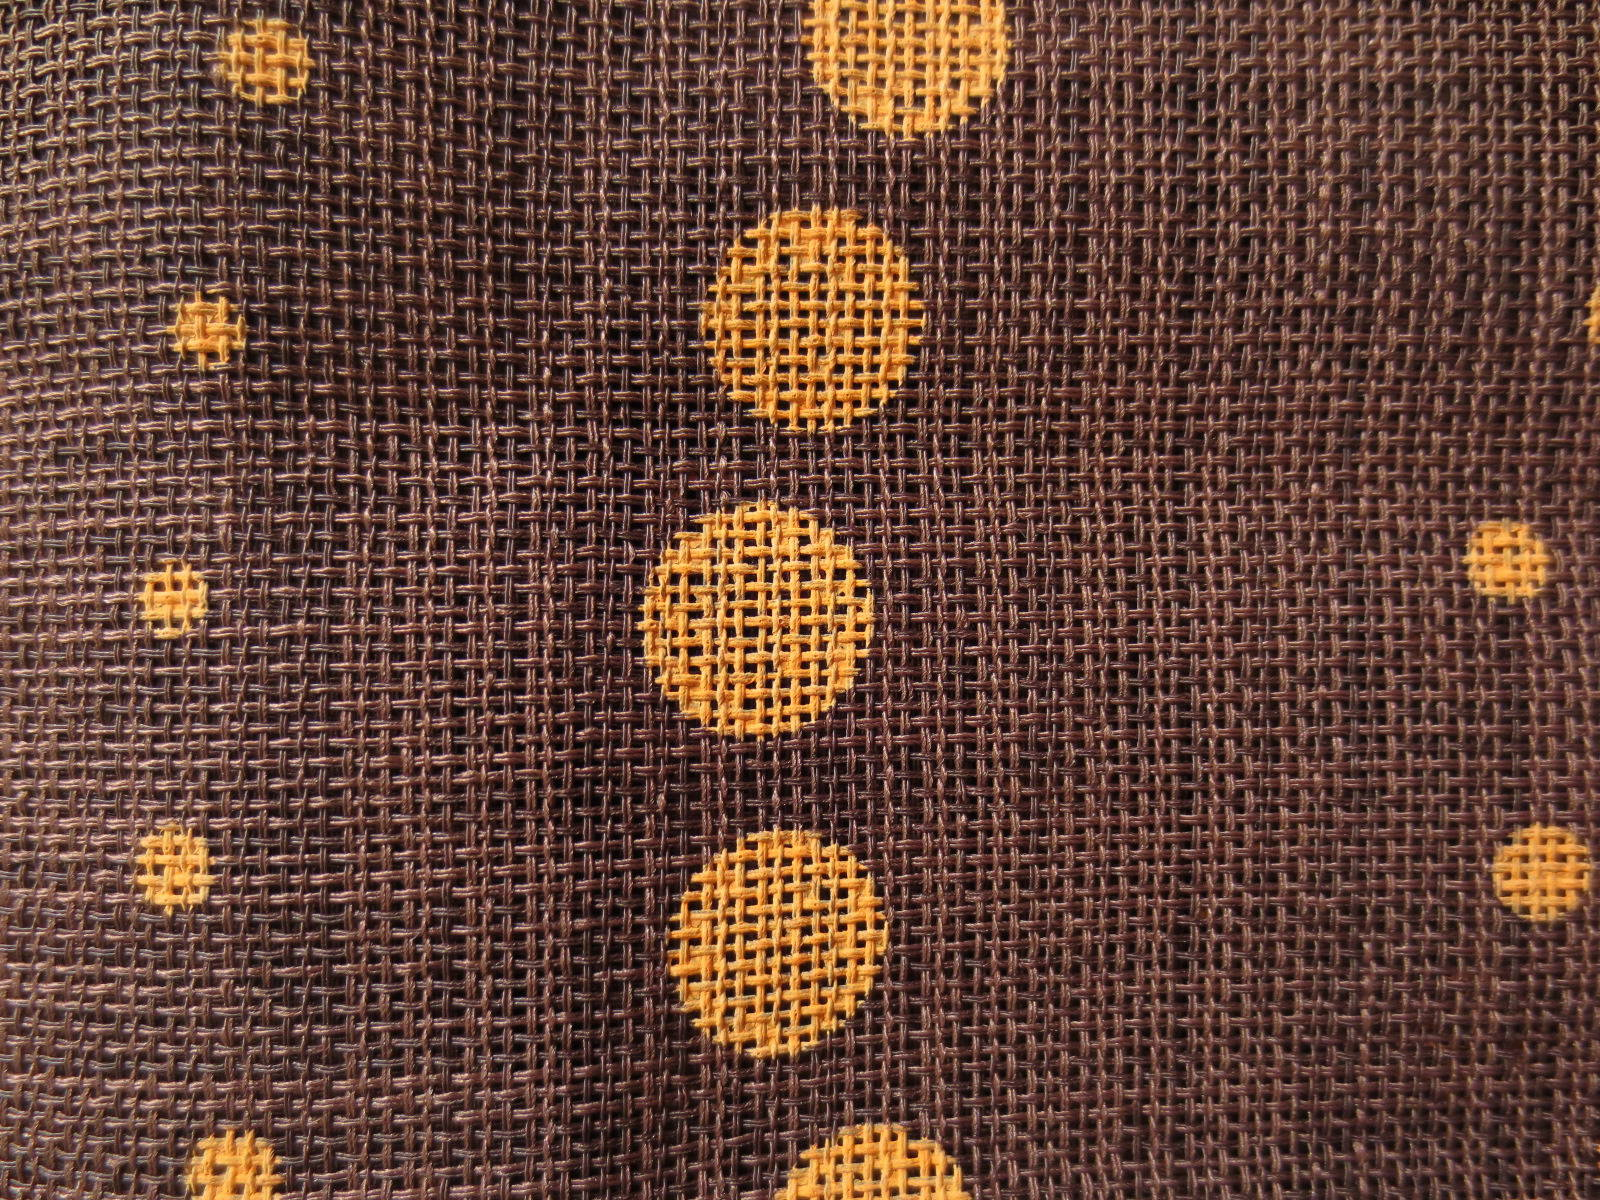 Tissu tarlatane motif oriental - 148 x 100 cm - marron et ocre